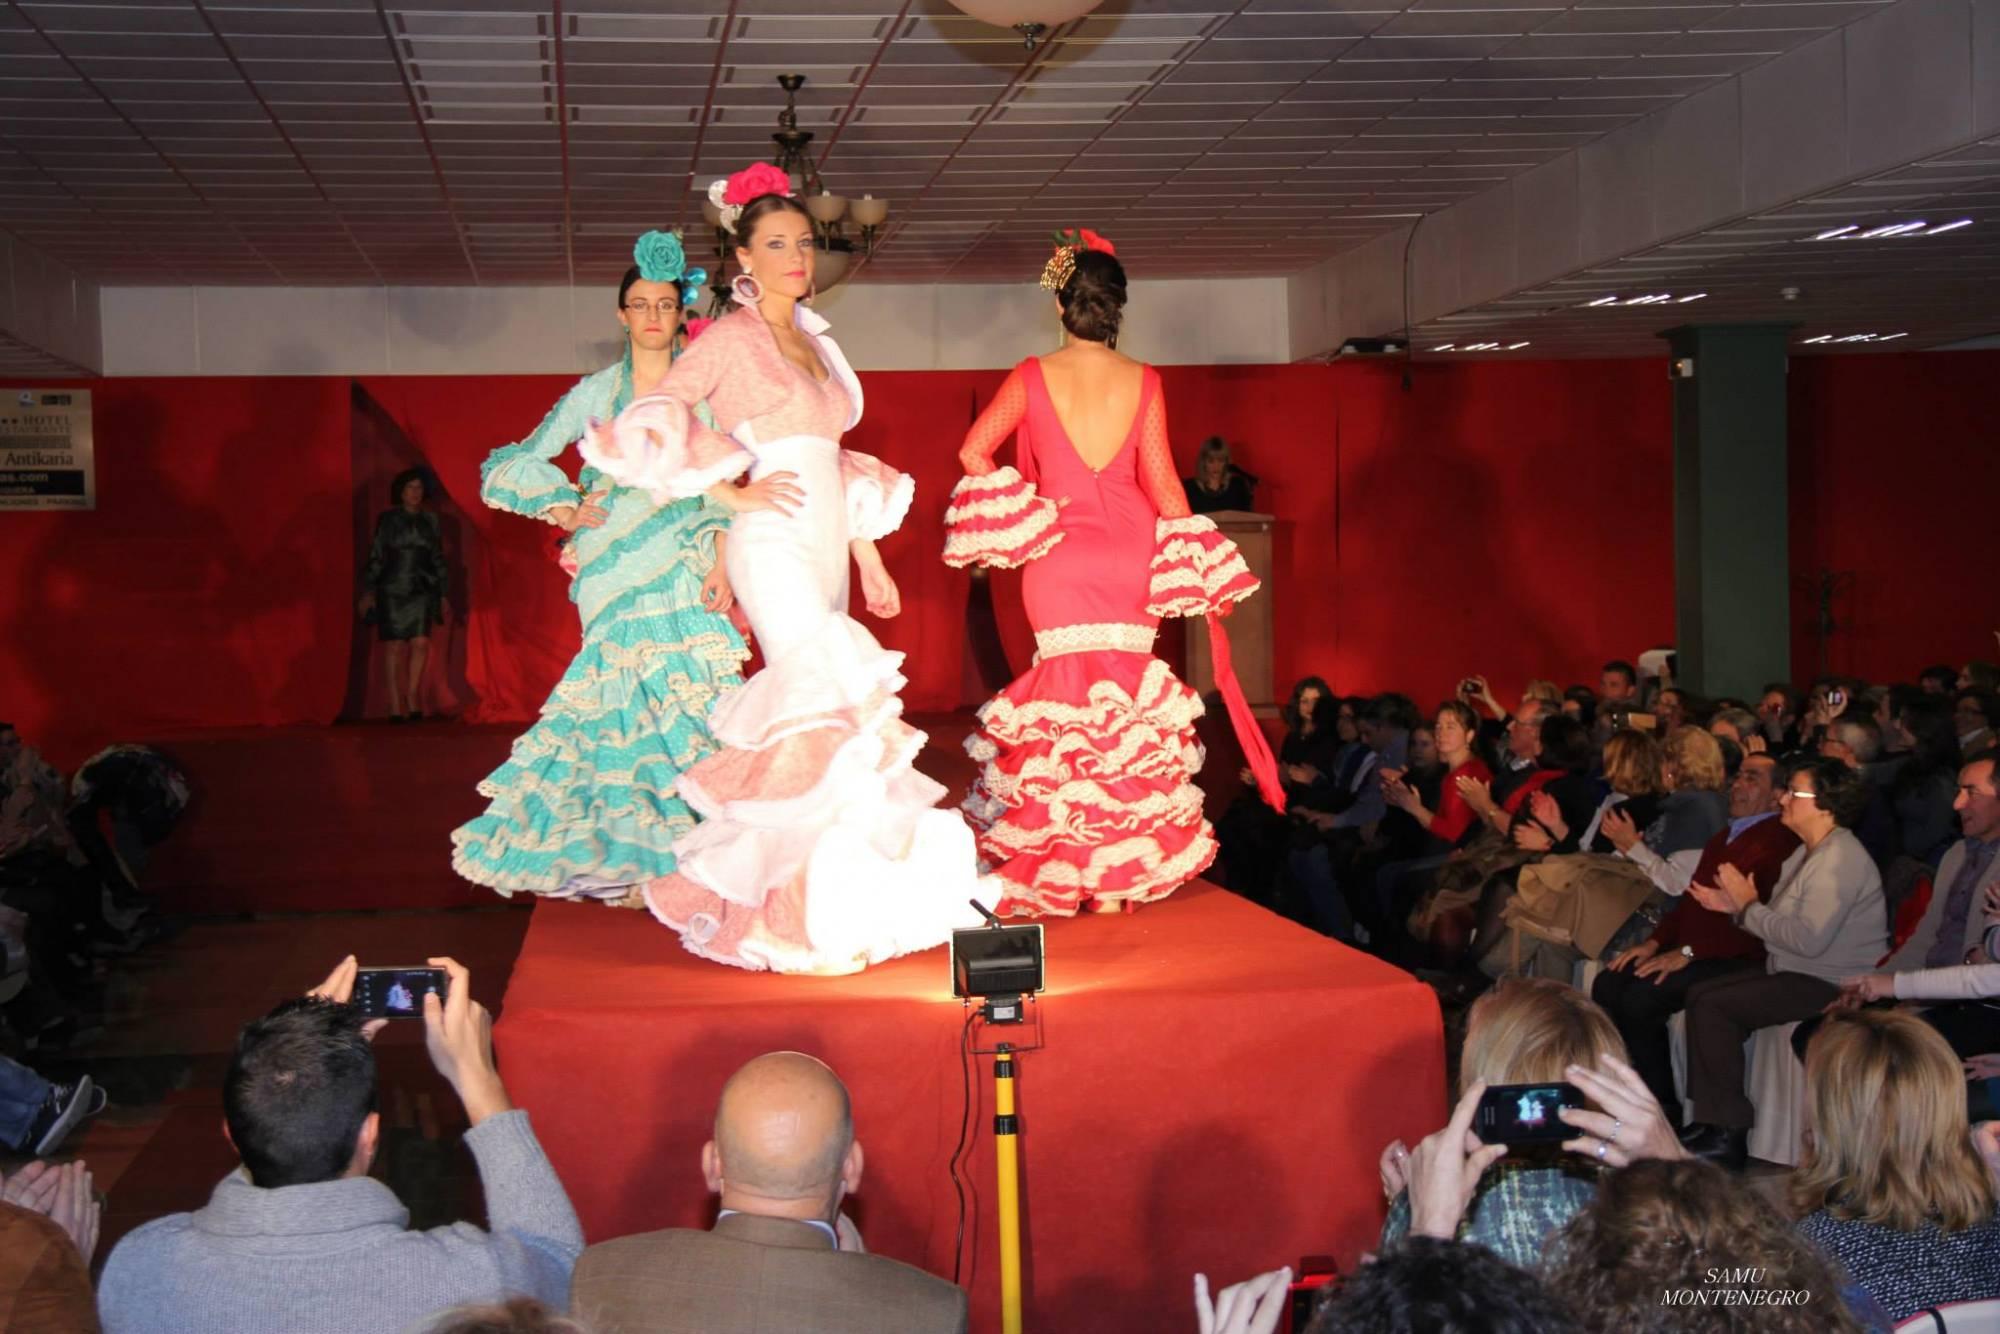 Especial Moda Flamenca con Jose Postigo